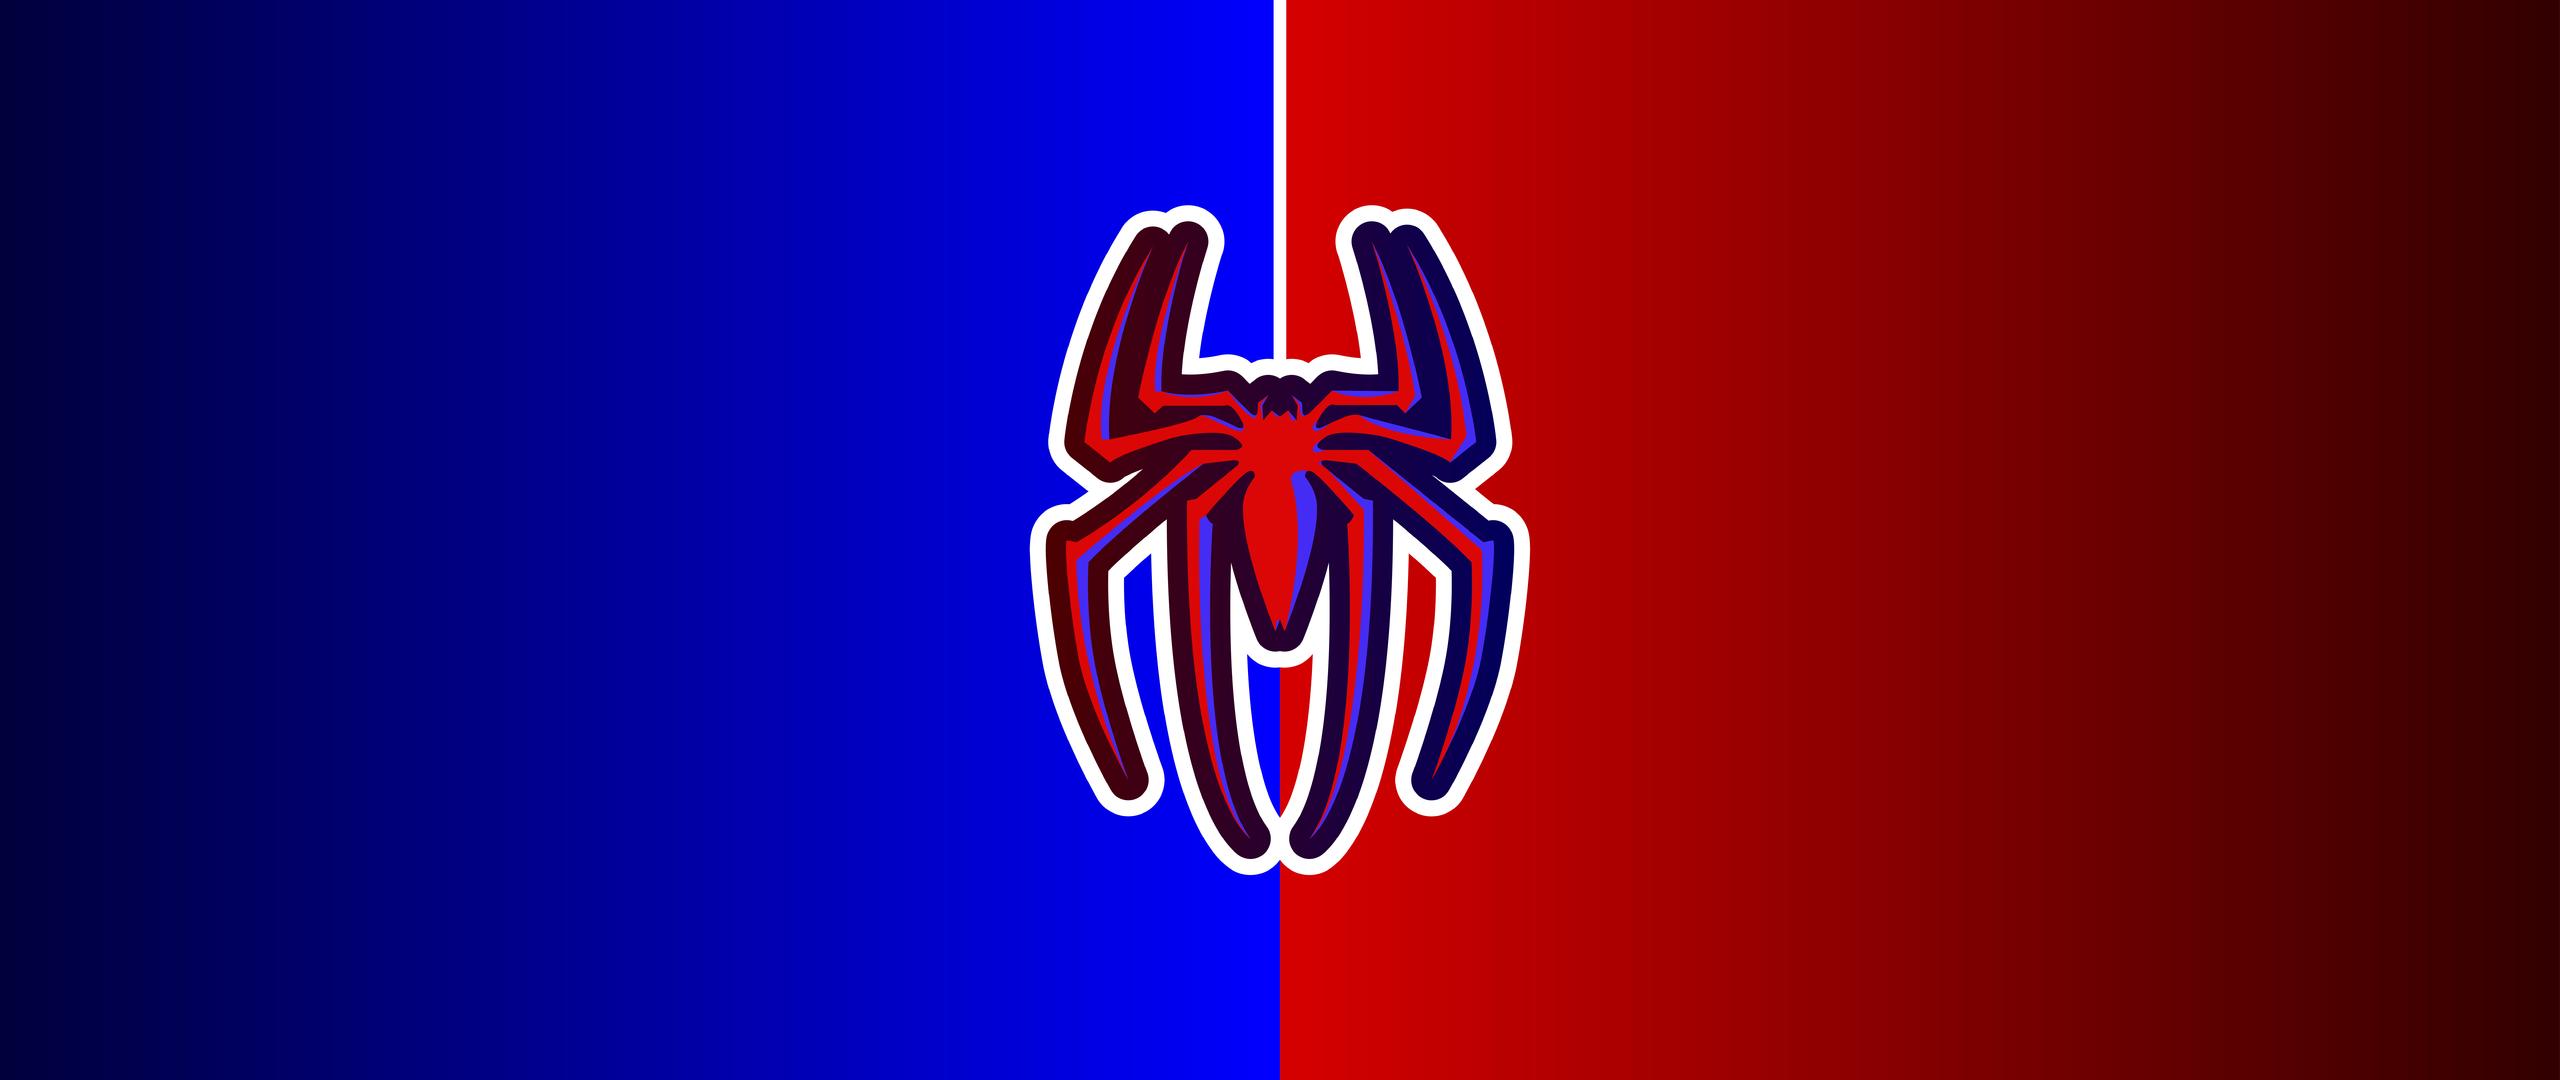 2560x1080 Spiderman Logo 12k 2560x1080 Resolution HD 4k ...